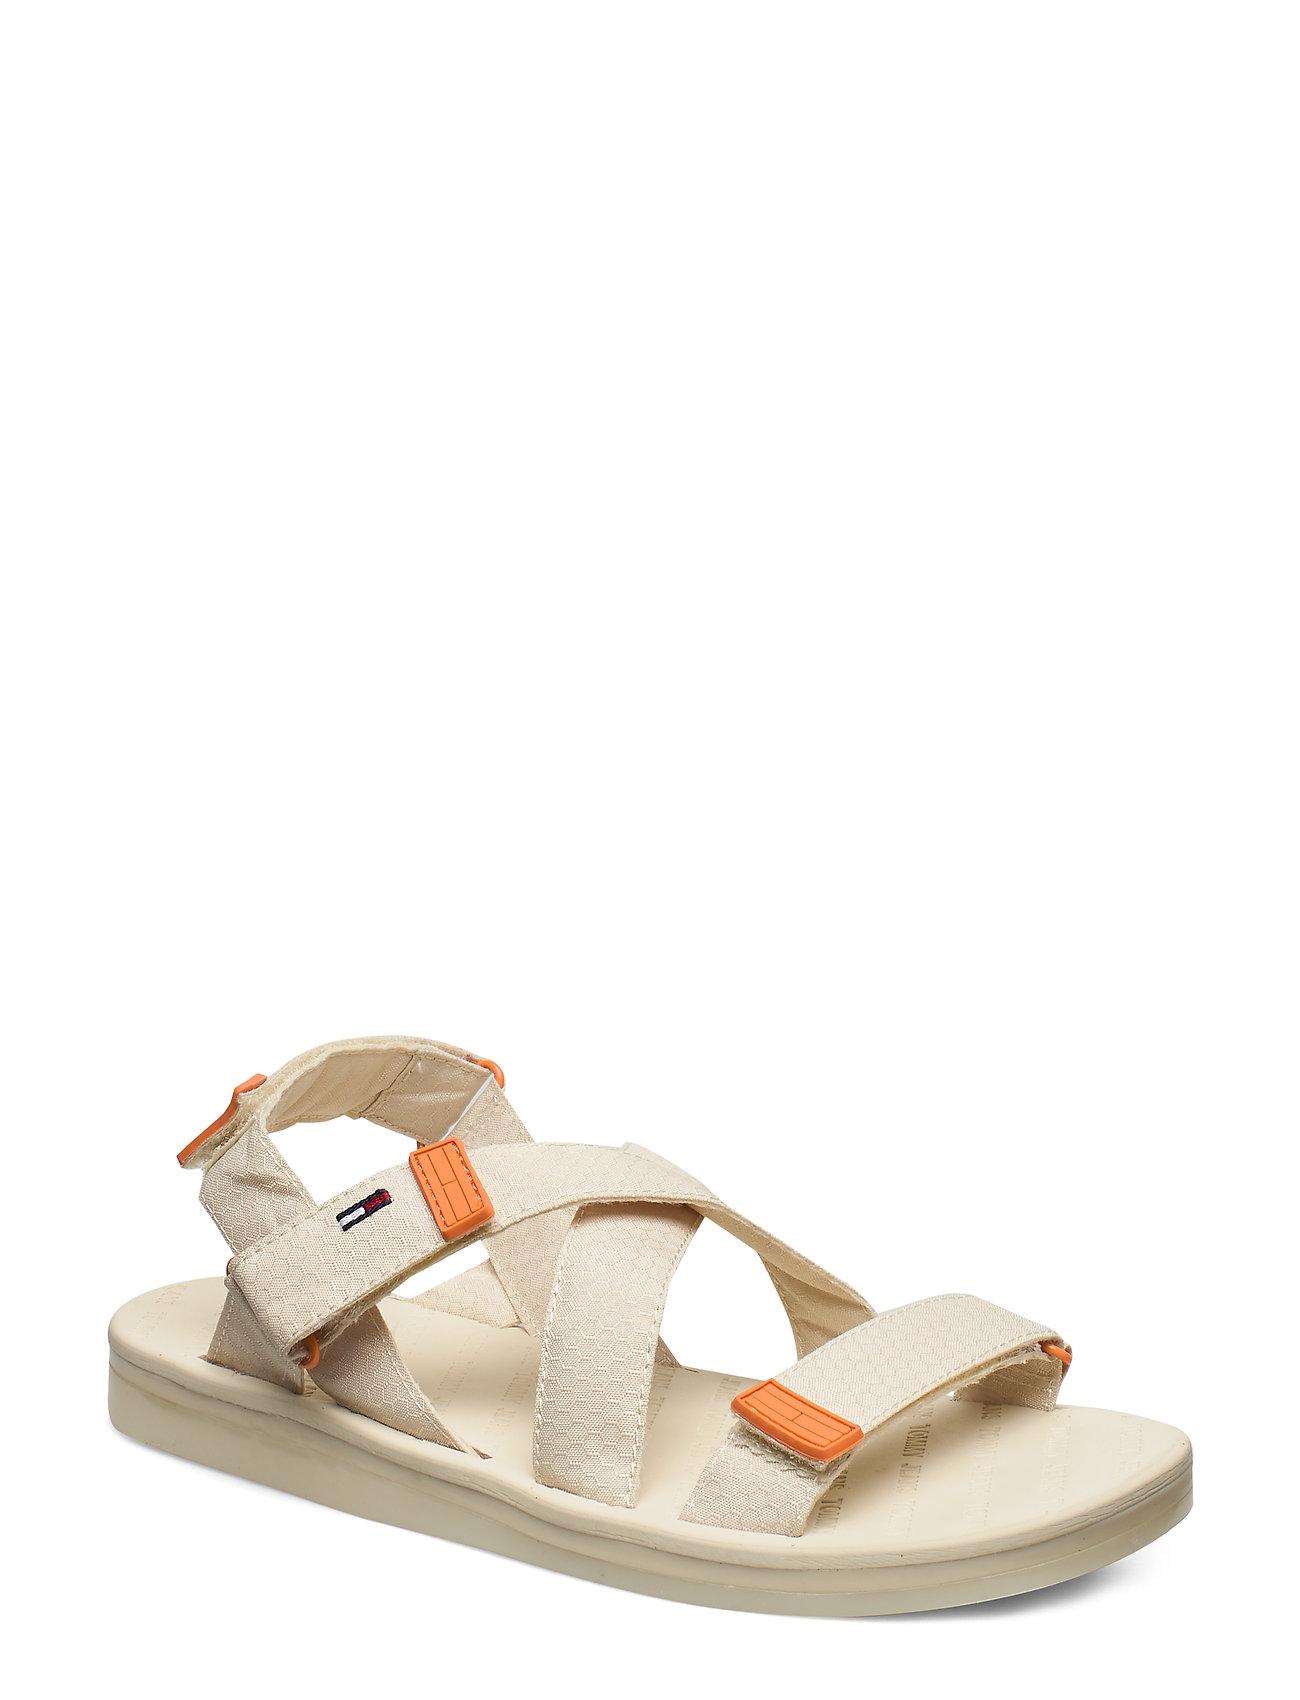 Image of Tommy Surplus Flat Sandal Shoes Summer Shoes Flat Sandals Creme Tommy Hilfiger (3355826805)